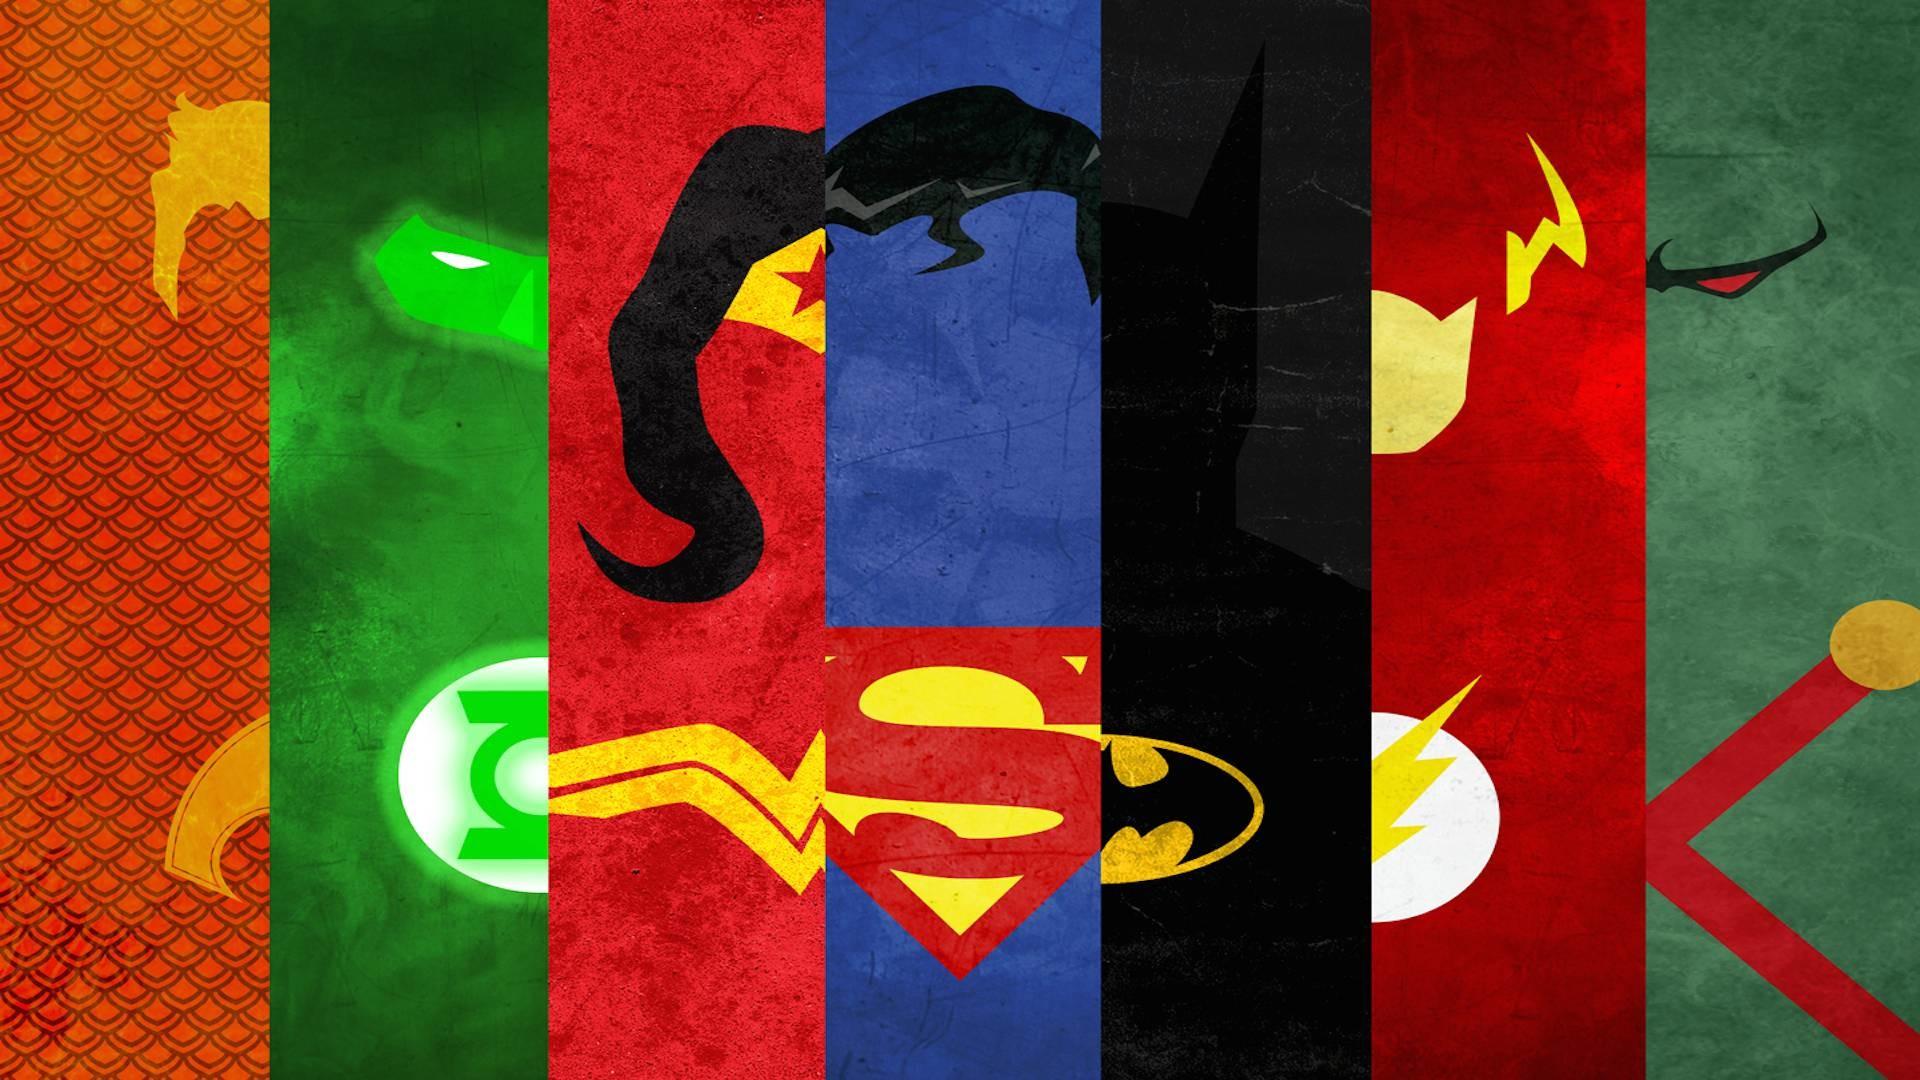 Justice League Of America Computer Wallpapers, Desktop Backgrounds .